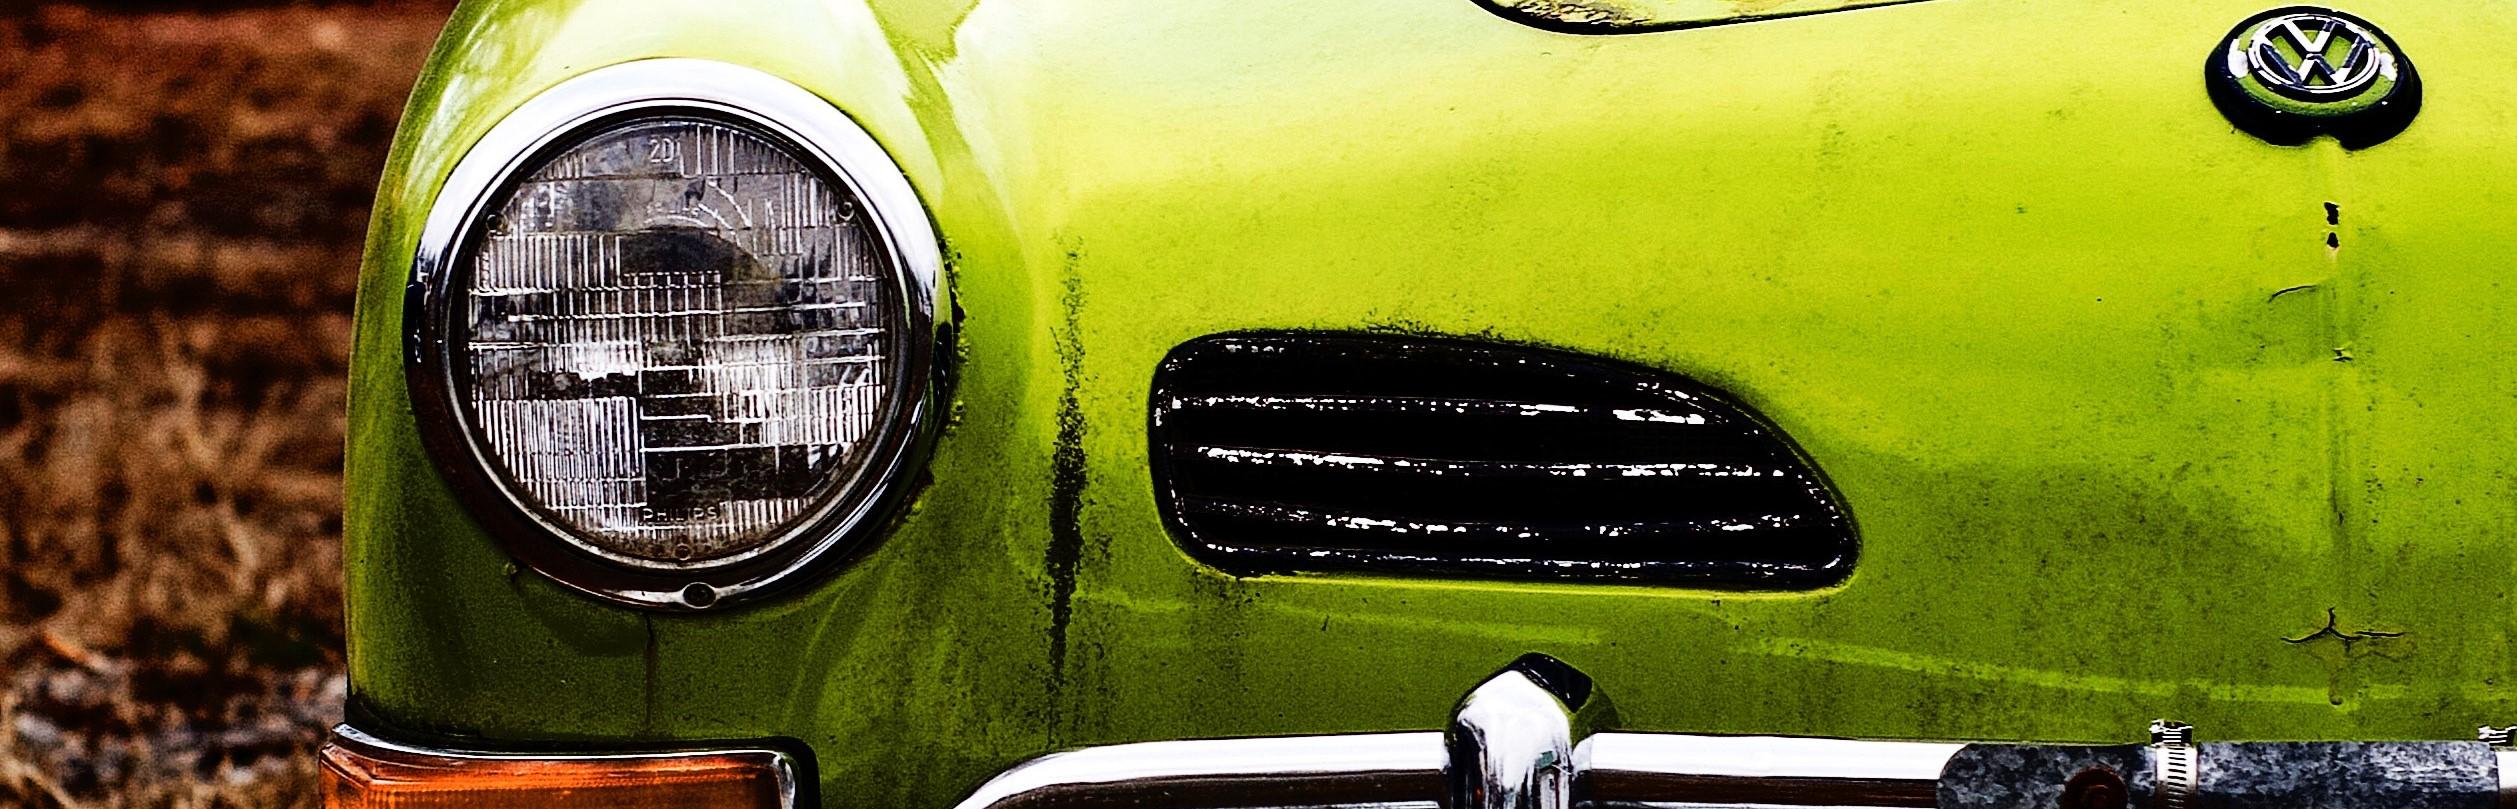 Green Oldtimer Volkswagen | Breast Cancer Car Donations